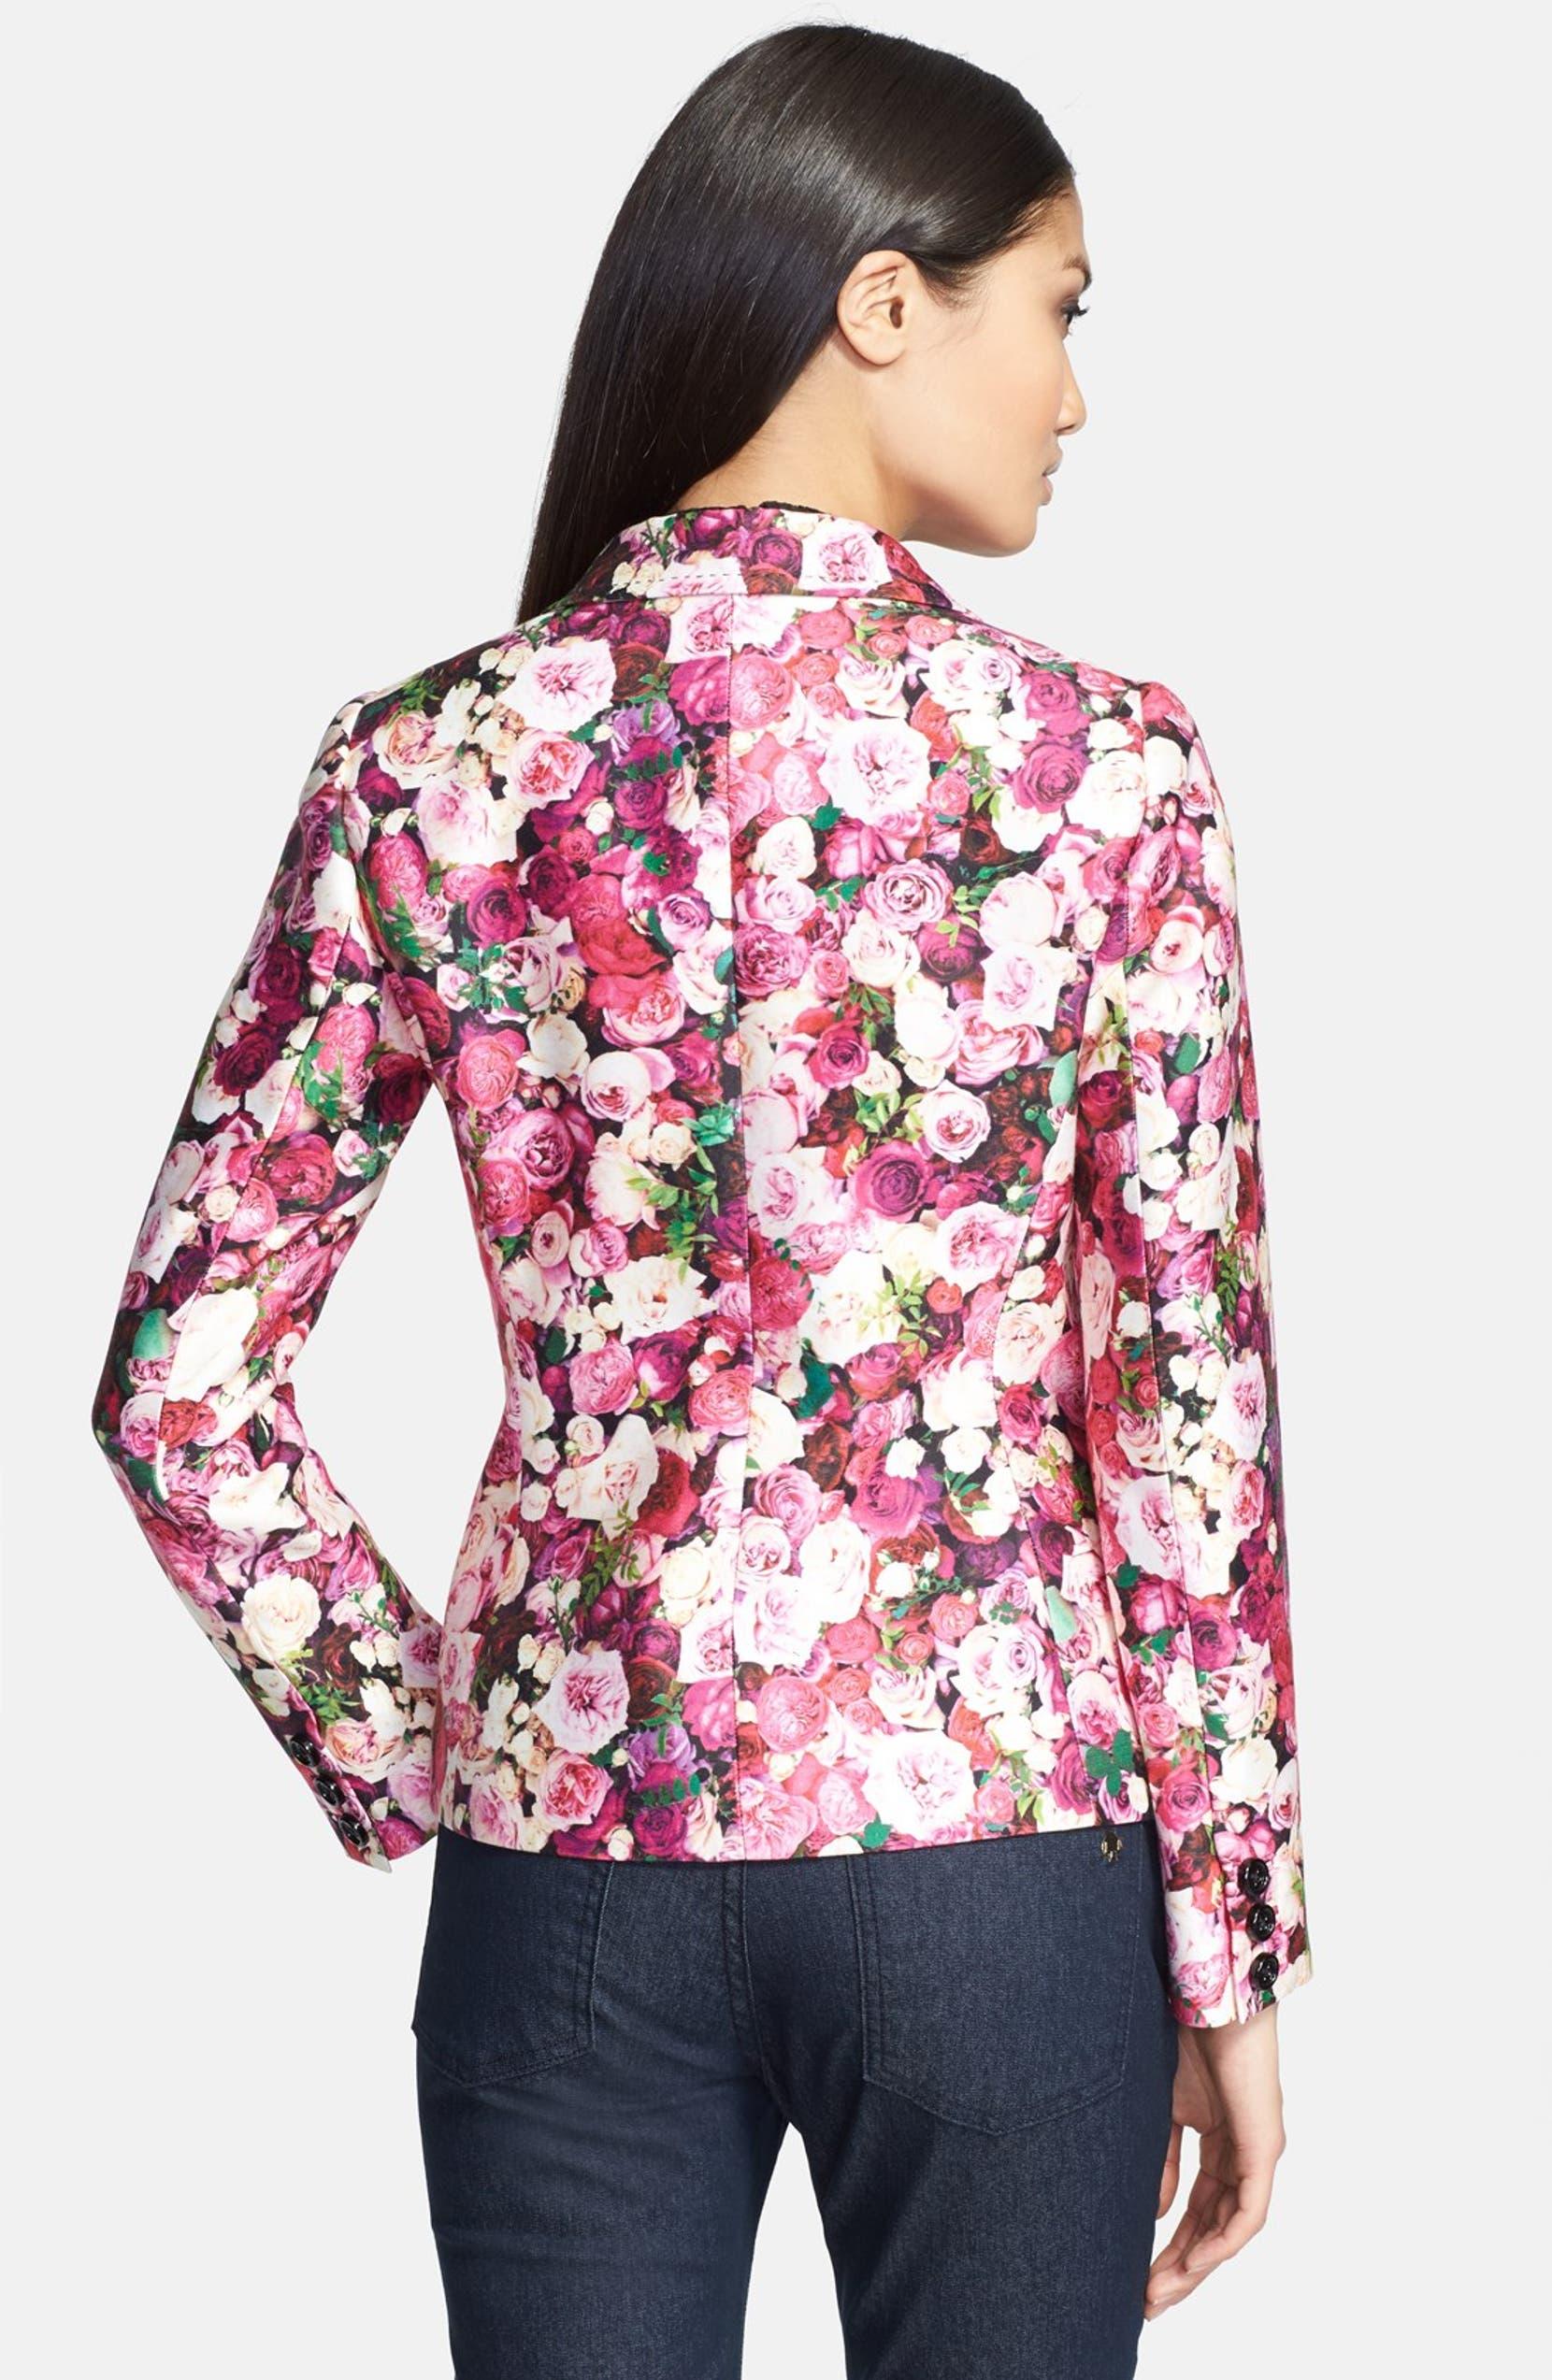 dbee1f32 kate spade new york 'millie' rose print blazer | Nordstrom